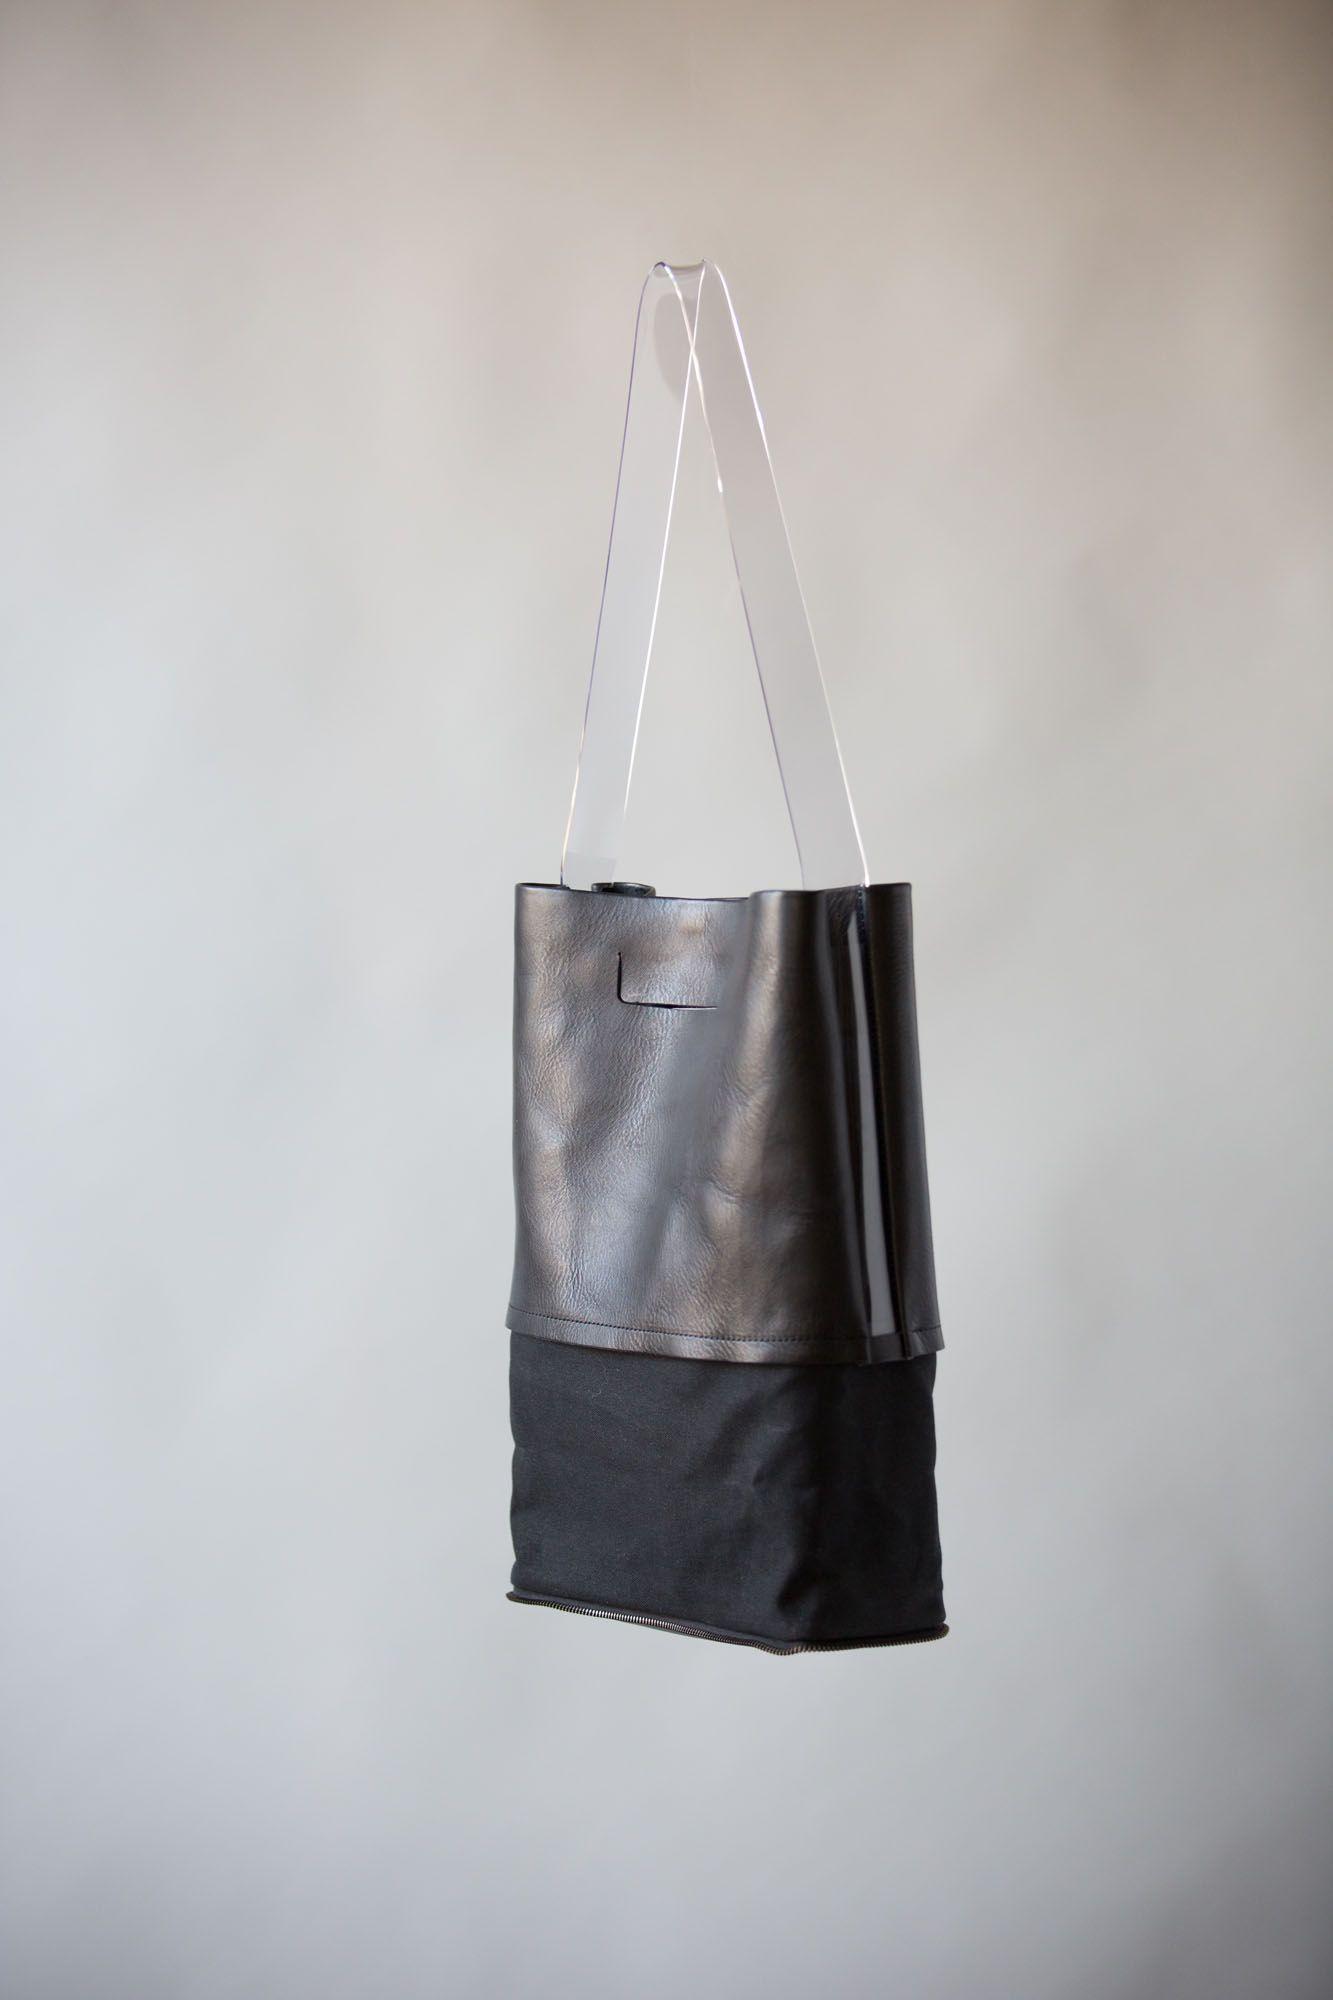 #Dusk #Leather #VegTan #Bag #CHIYOME